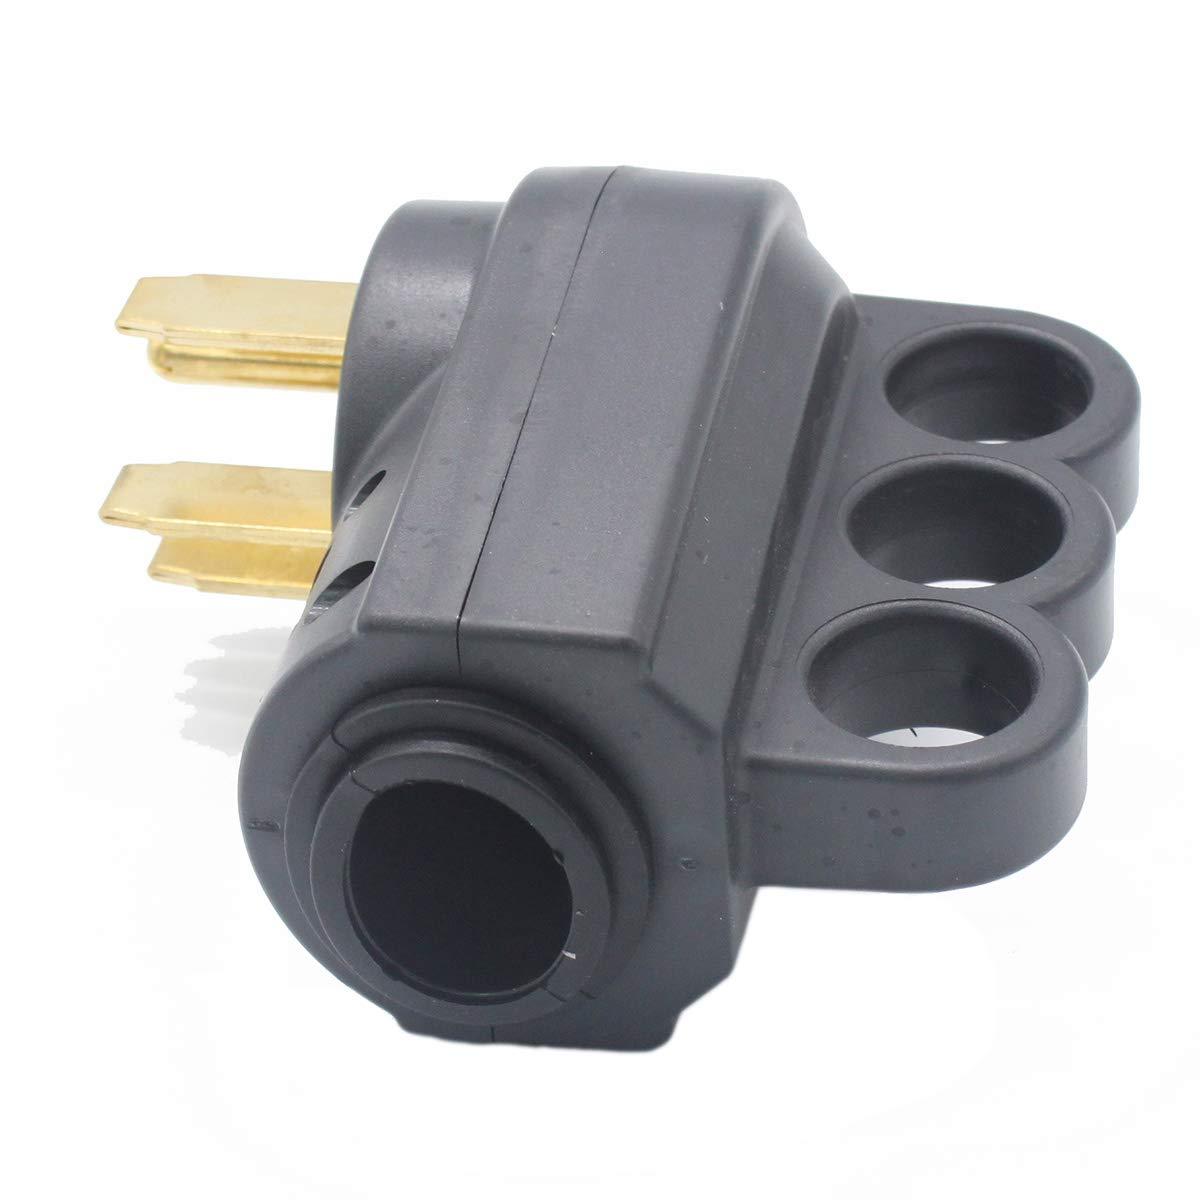 X-Haibei RV 50A Female Replacement Plug Black 125V//250V Connector Heavy Duty Handle